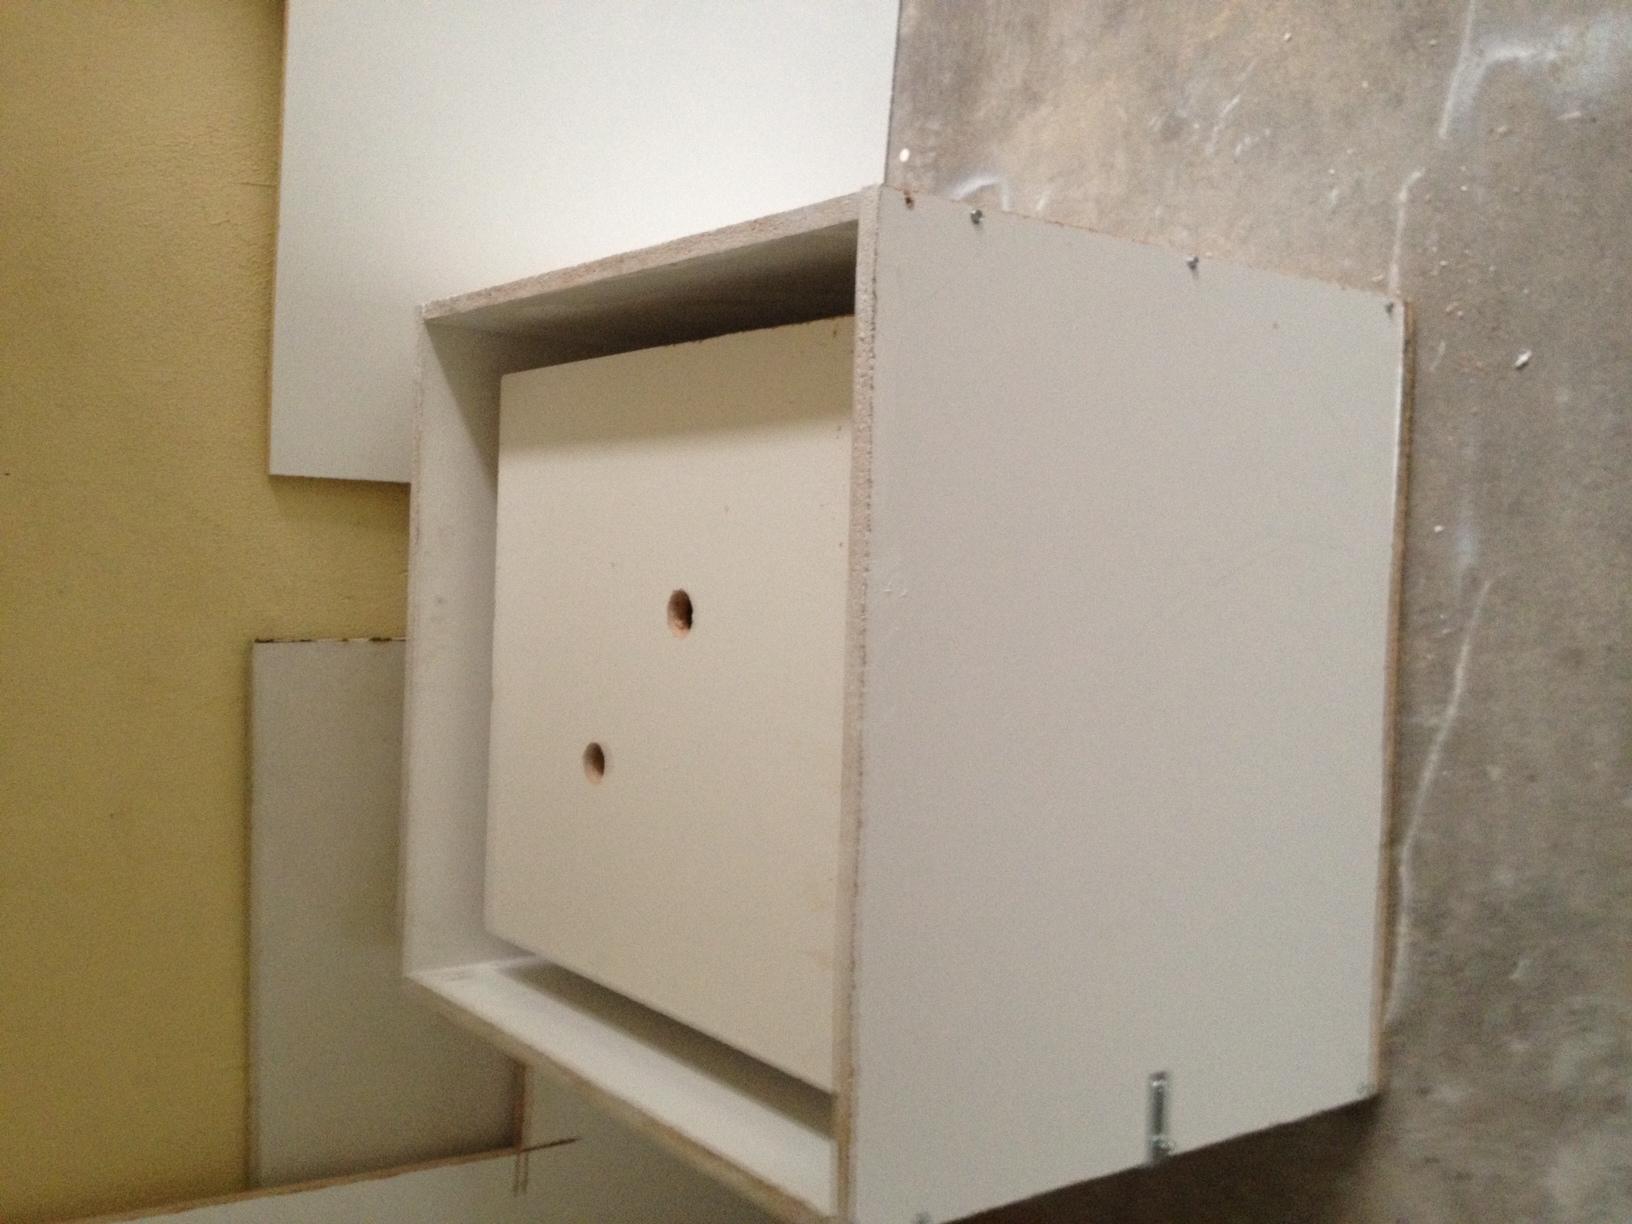 Melamine Mold construct 25W x 25